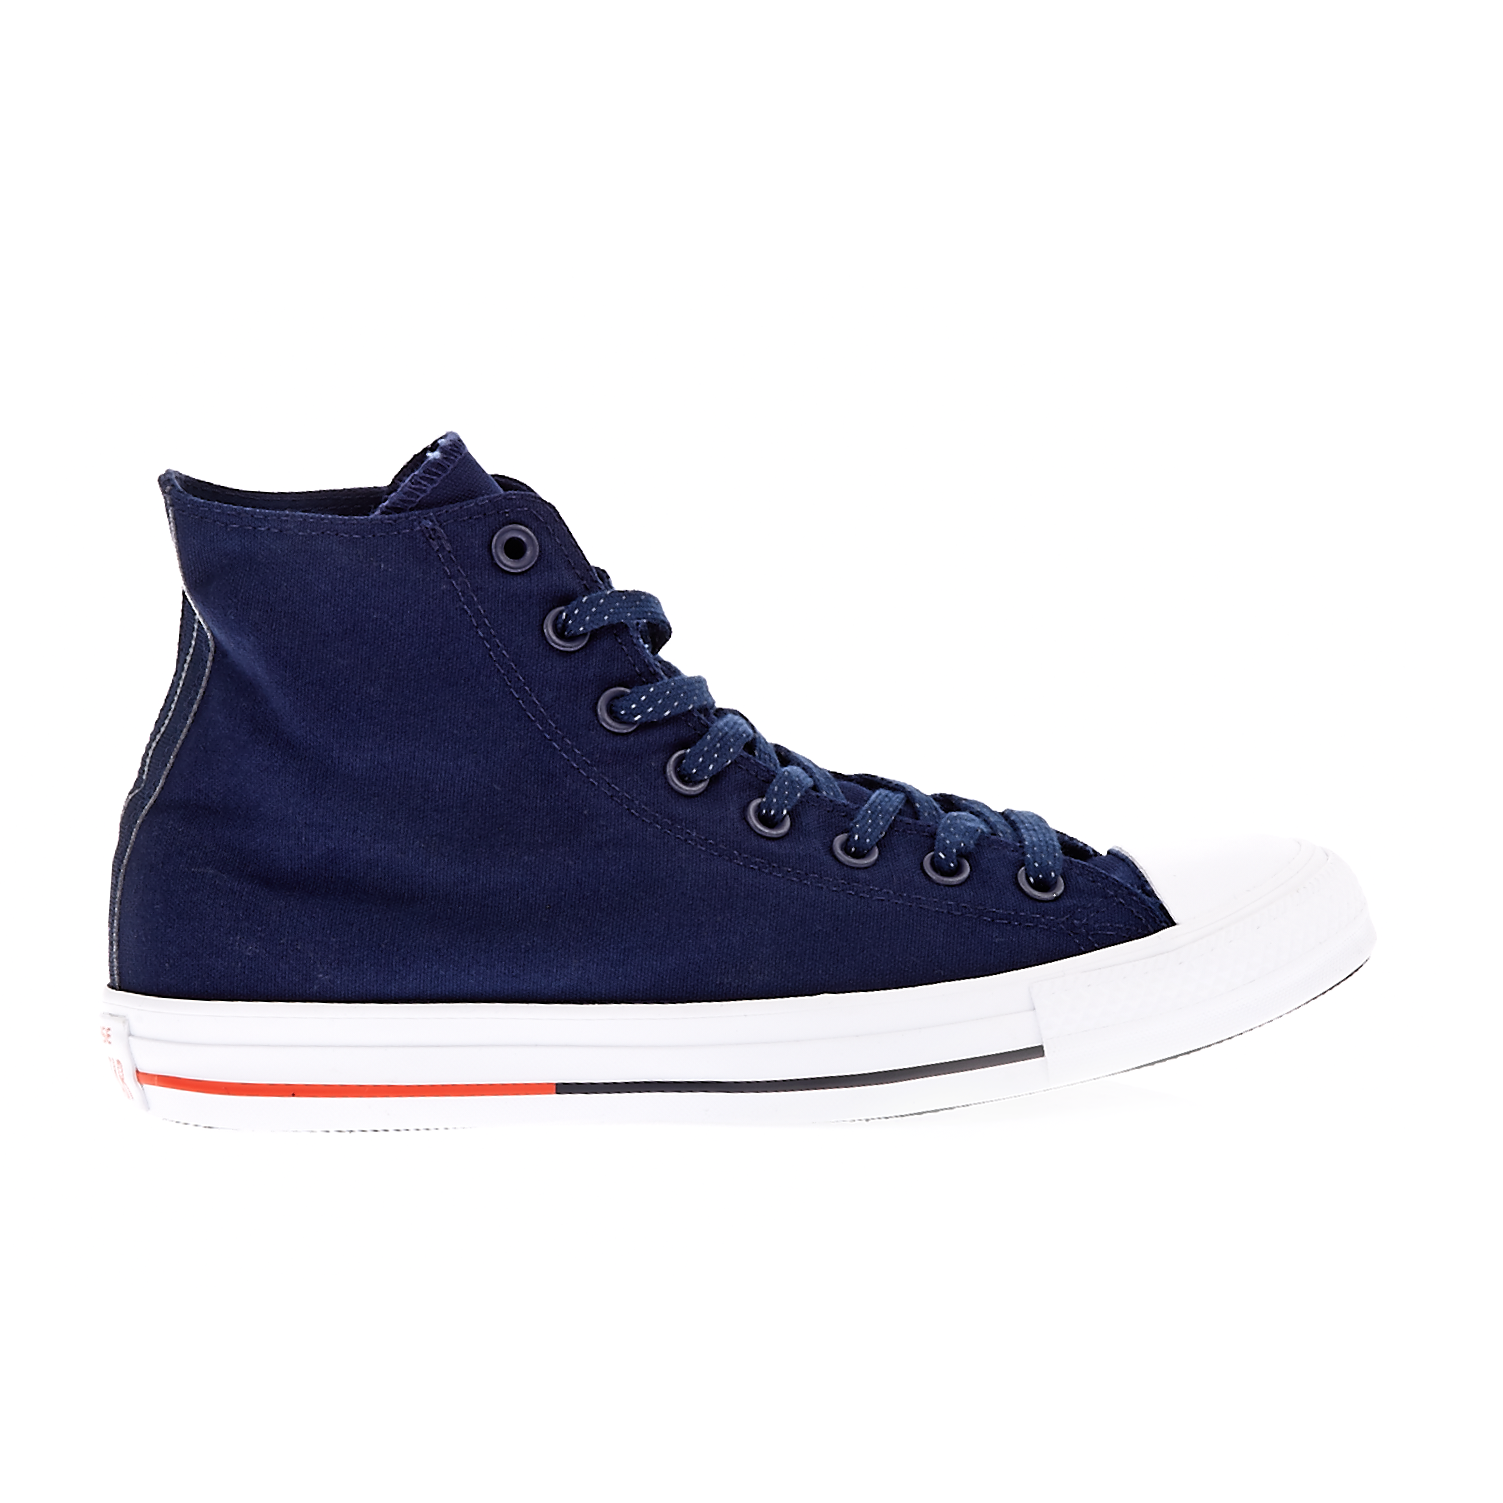 CONVERSE - Unisex παπούτσια Chuck Taylor All Star Hi μπλε ανδρικά παπούτσια sneakers